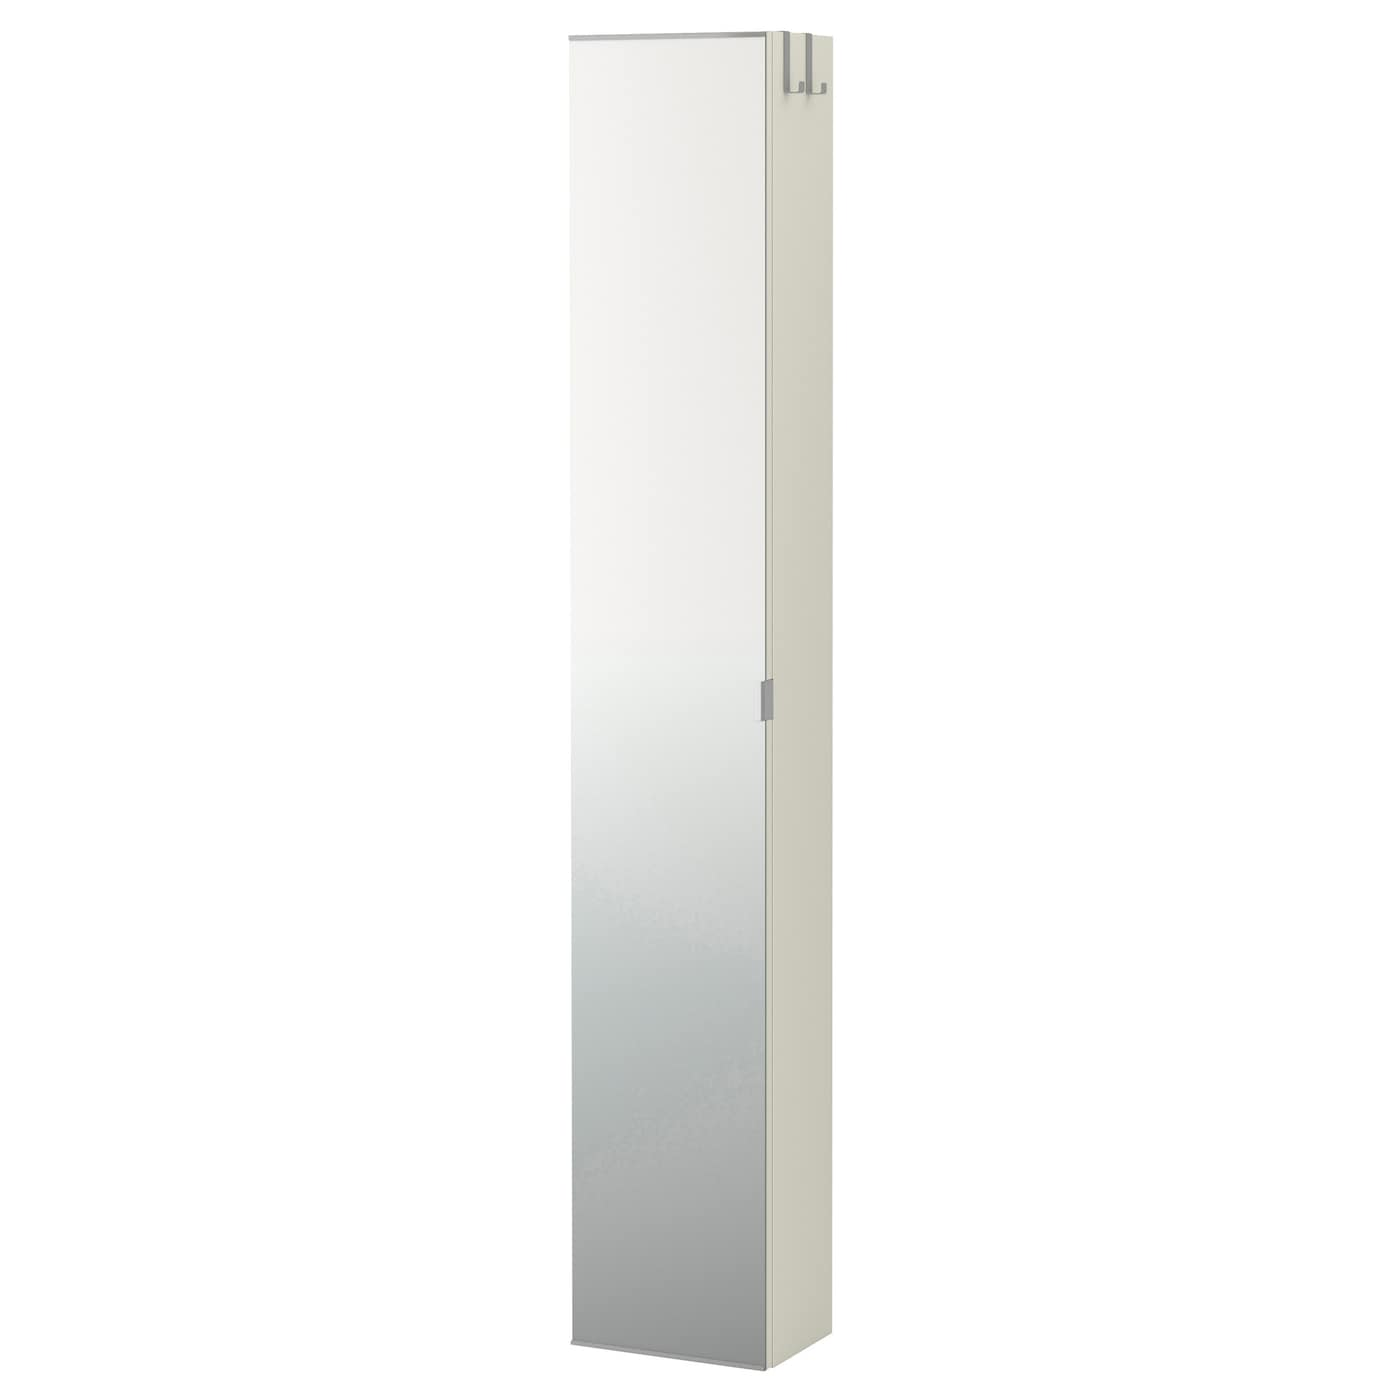 Lill ngen hoge kast met spiegeldeur wit 30 x 21 x 179 cm - Ikea portascope ...